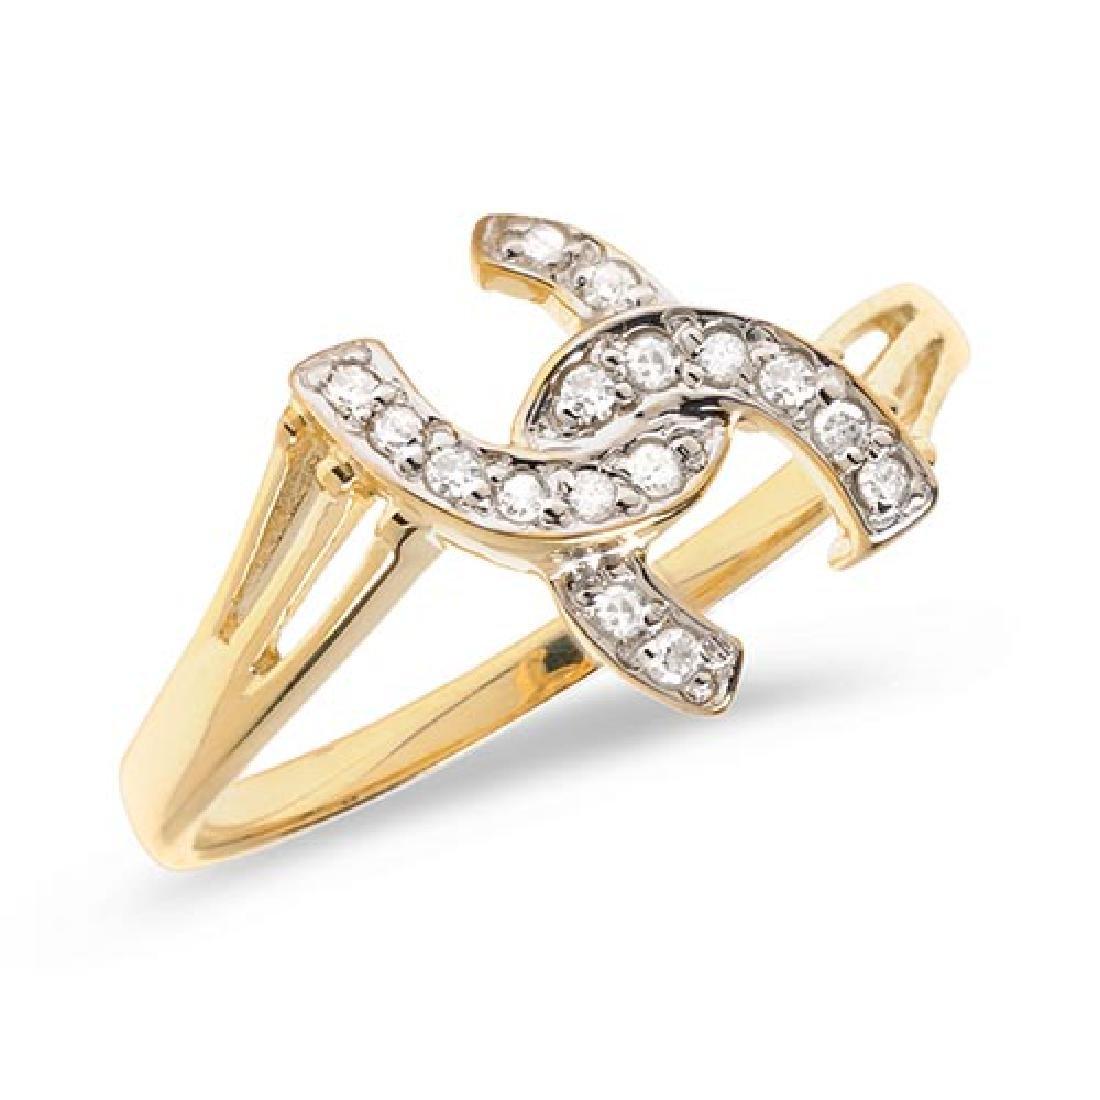 Certified 14K Yellow Gold Diamond Horseshoe Ring